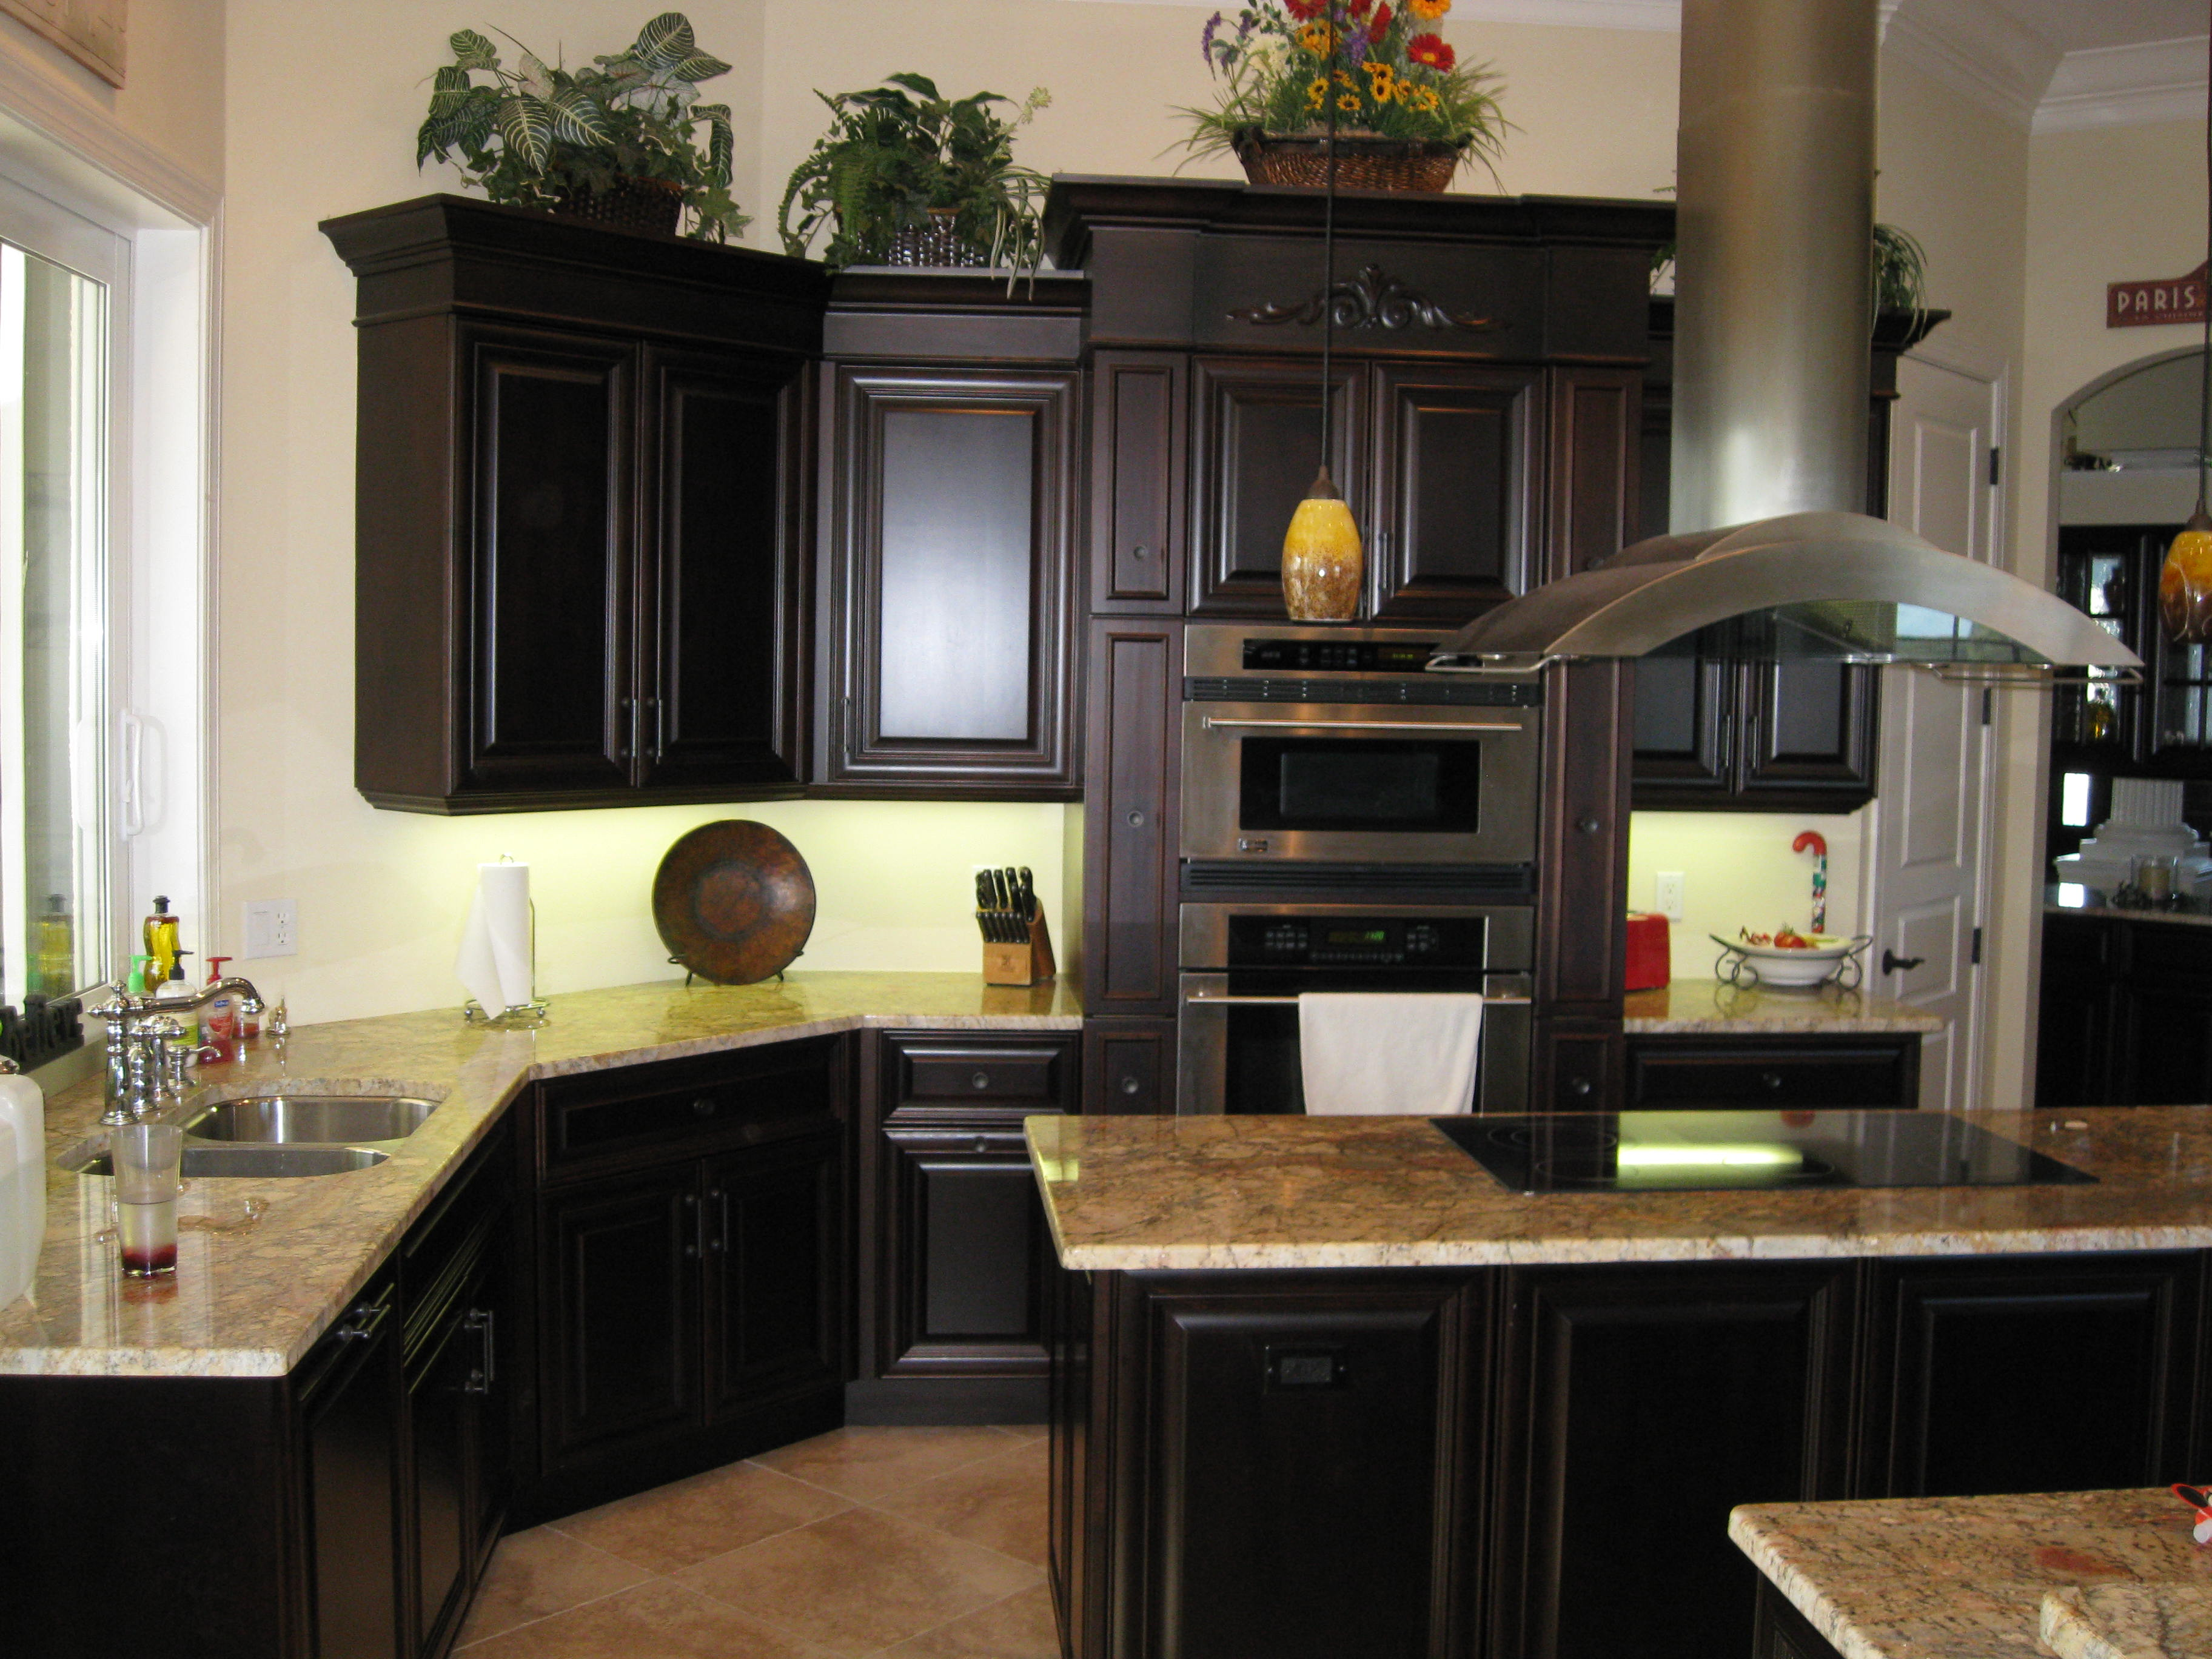 kitchen interior furniture amish kitchen cabinets black painted with gray granite kitchen cabinets pictures countertops luxury kitchen cabinets kitchen cabinets cherry